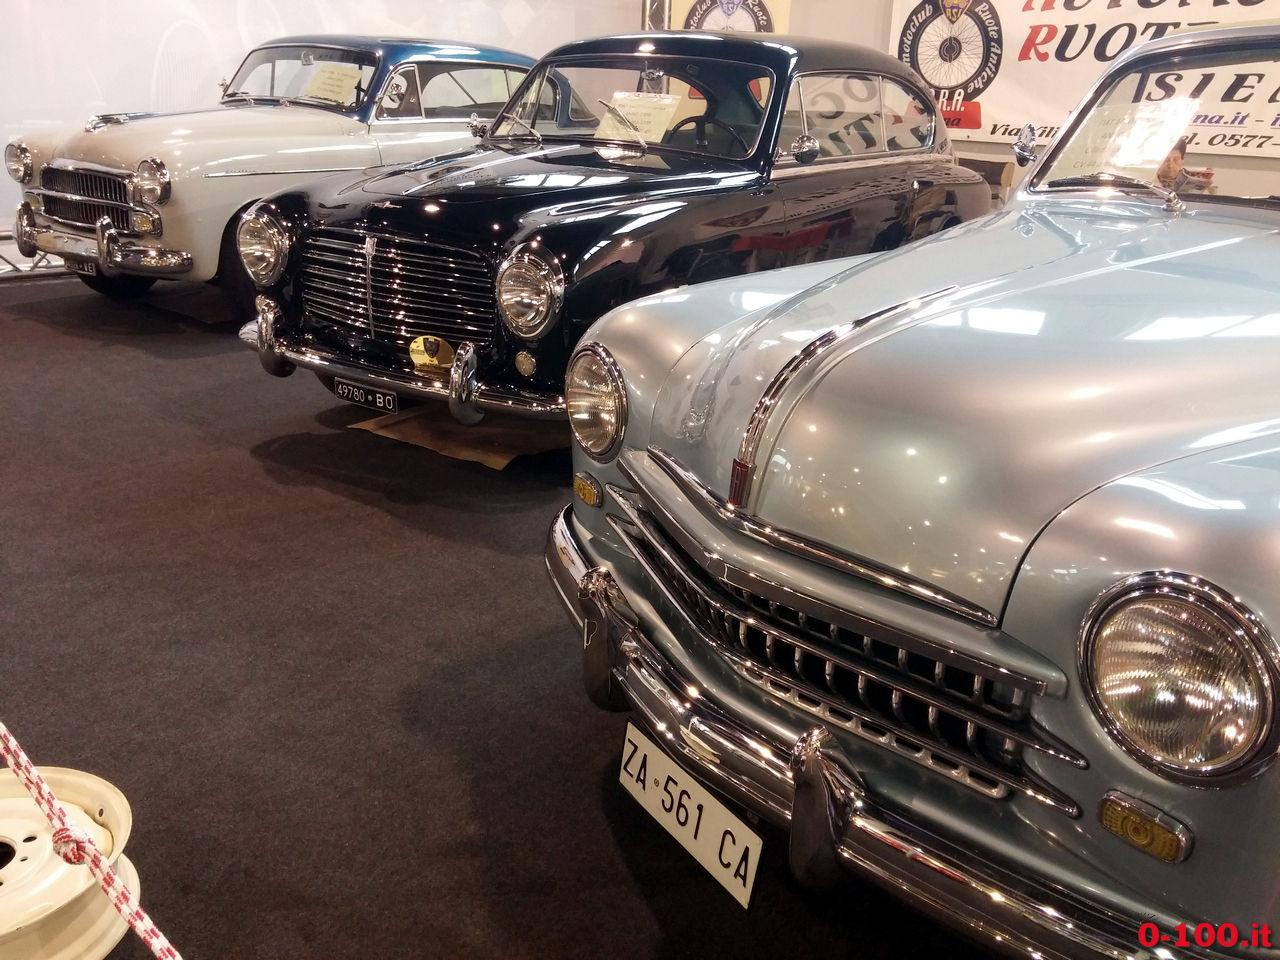 automotodepoca-2016-car-market-mercato-auto-prezzo-price_0-1004